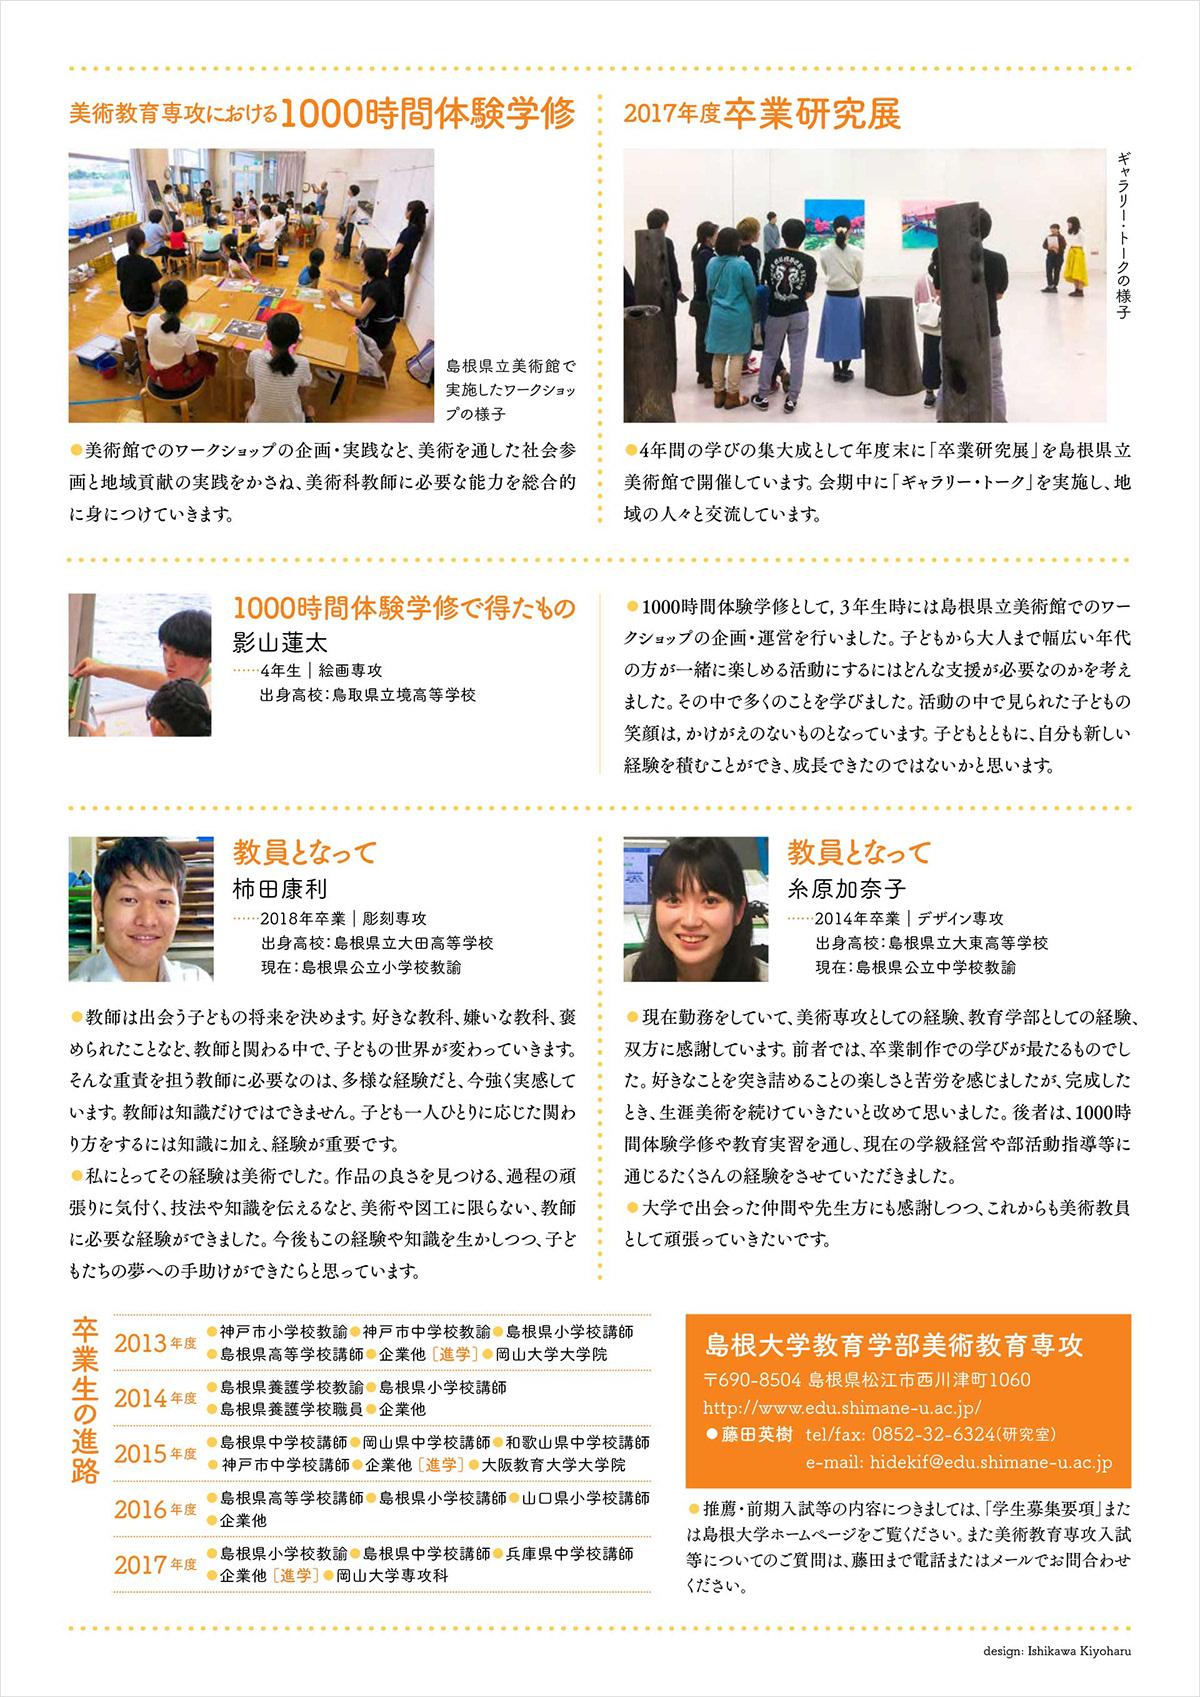 Shimane University matsue